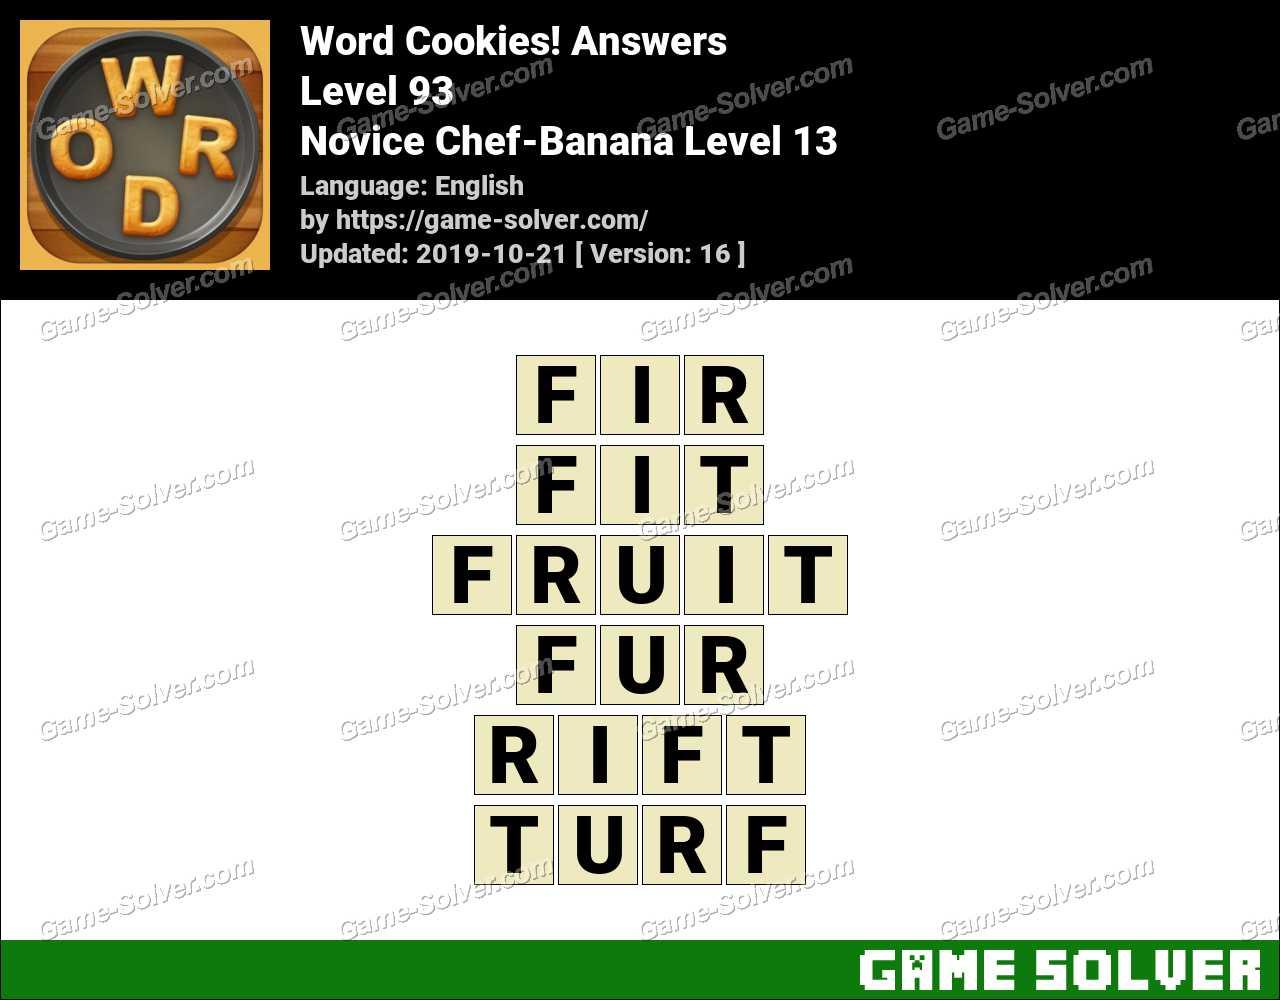 Word Cookies Novice Chef-Banana Level 13 Answers